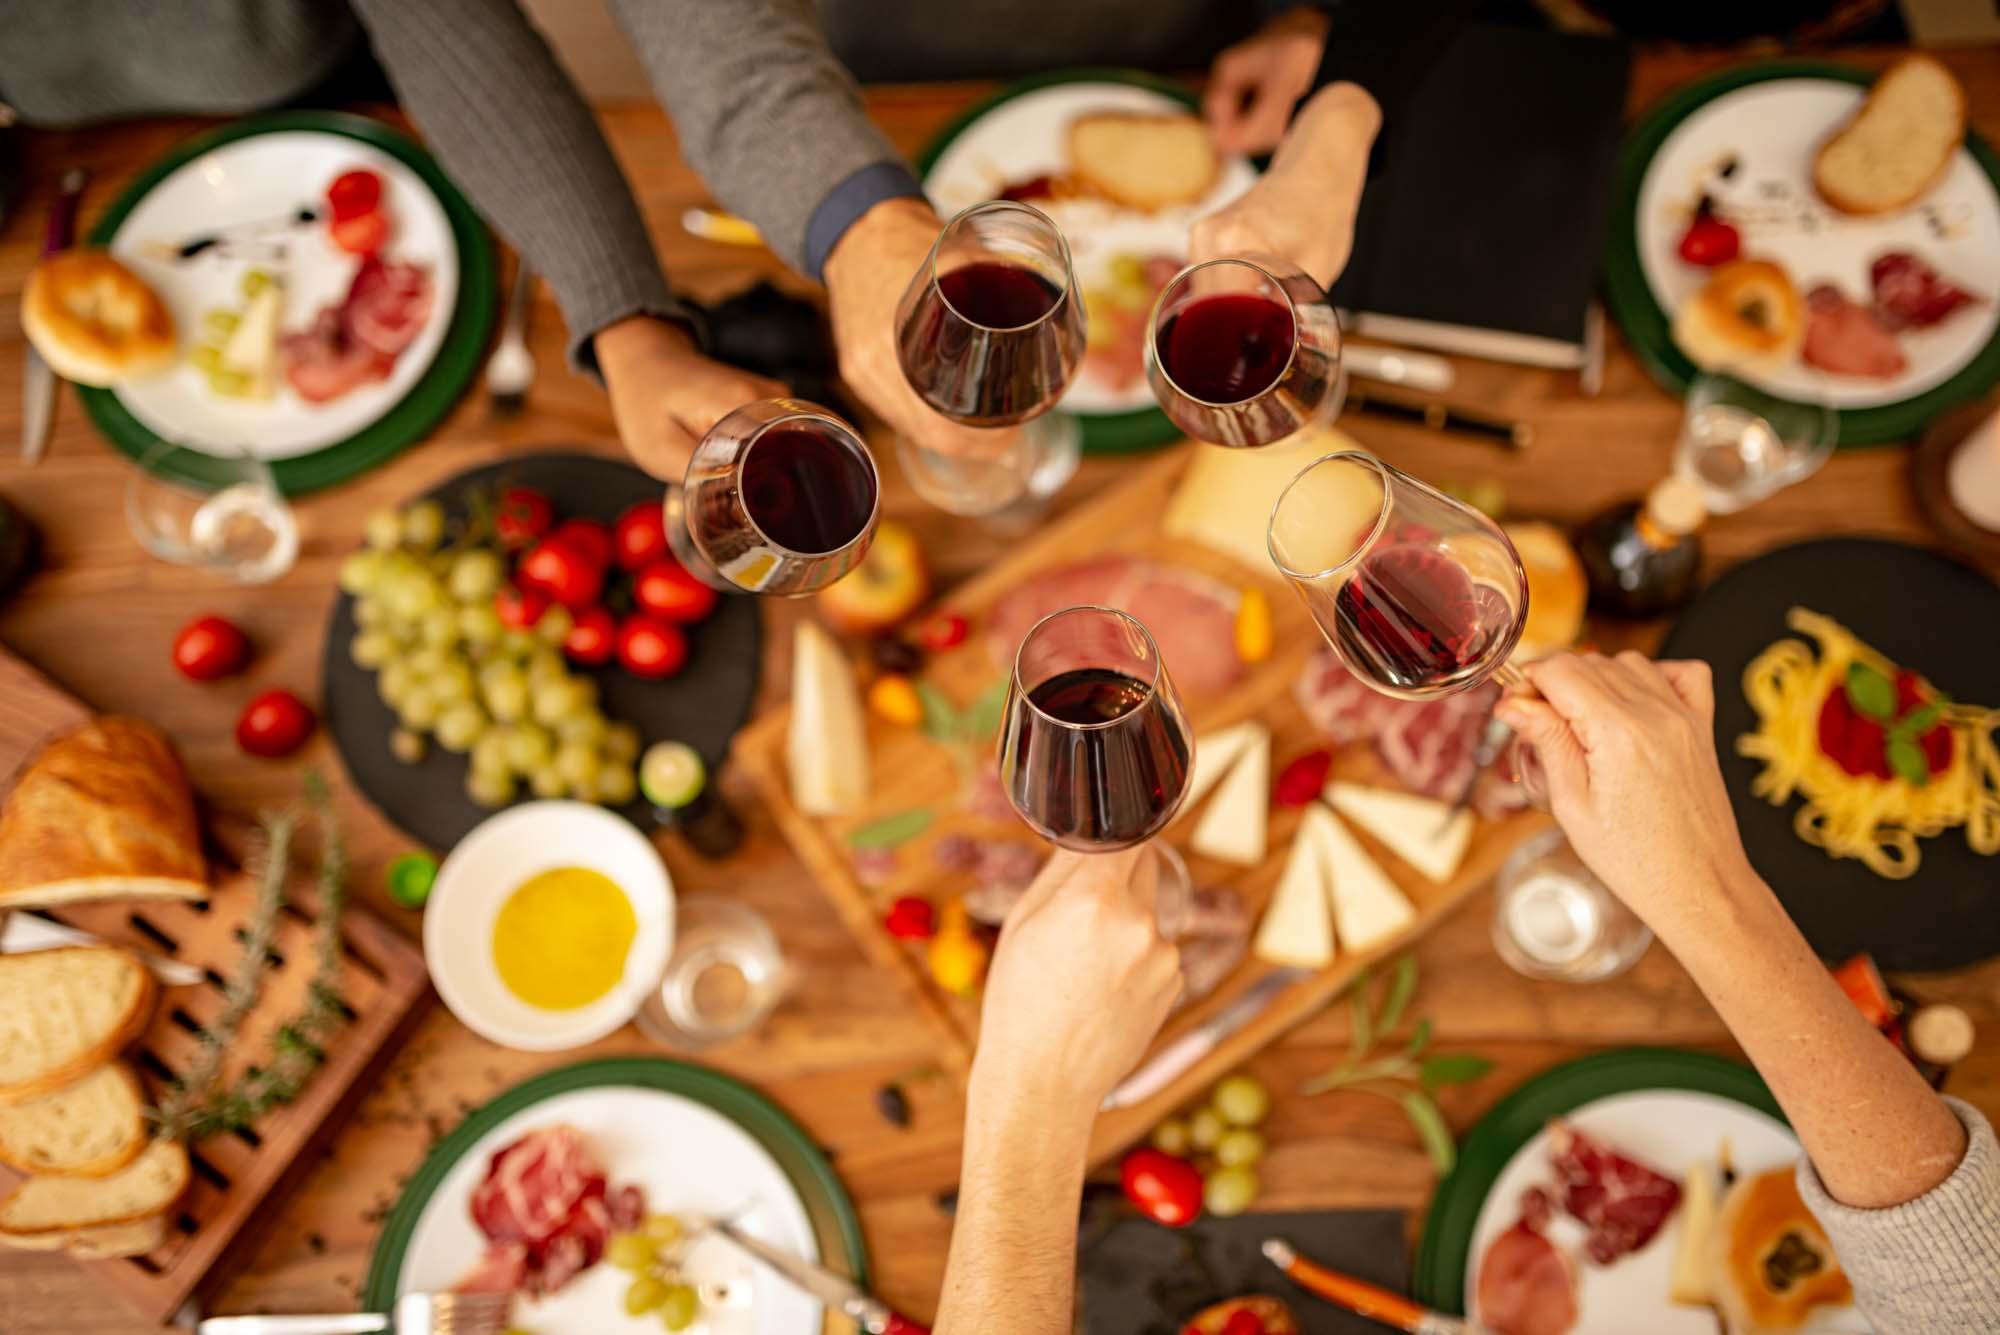 Cucina Amatoriale Eventi Aziendali a Taranto